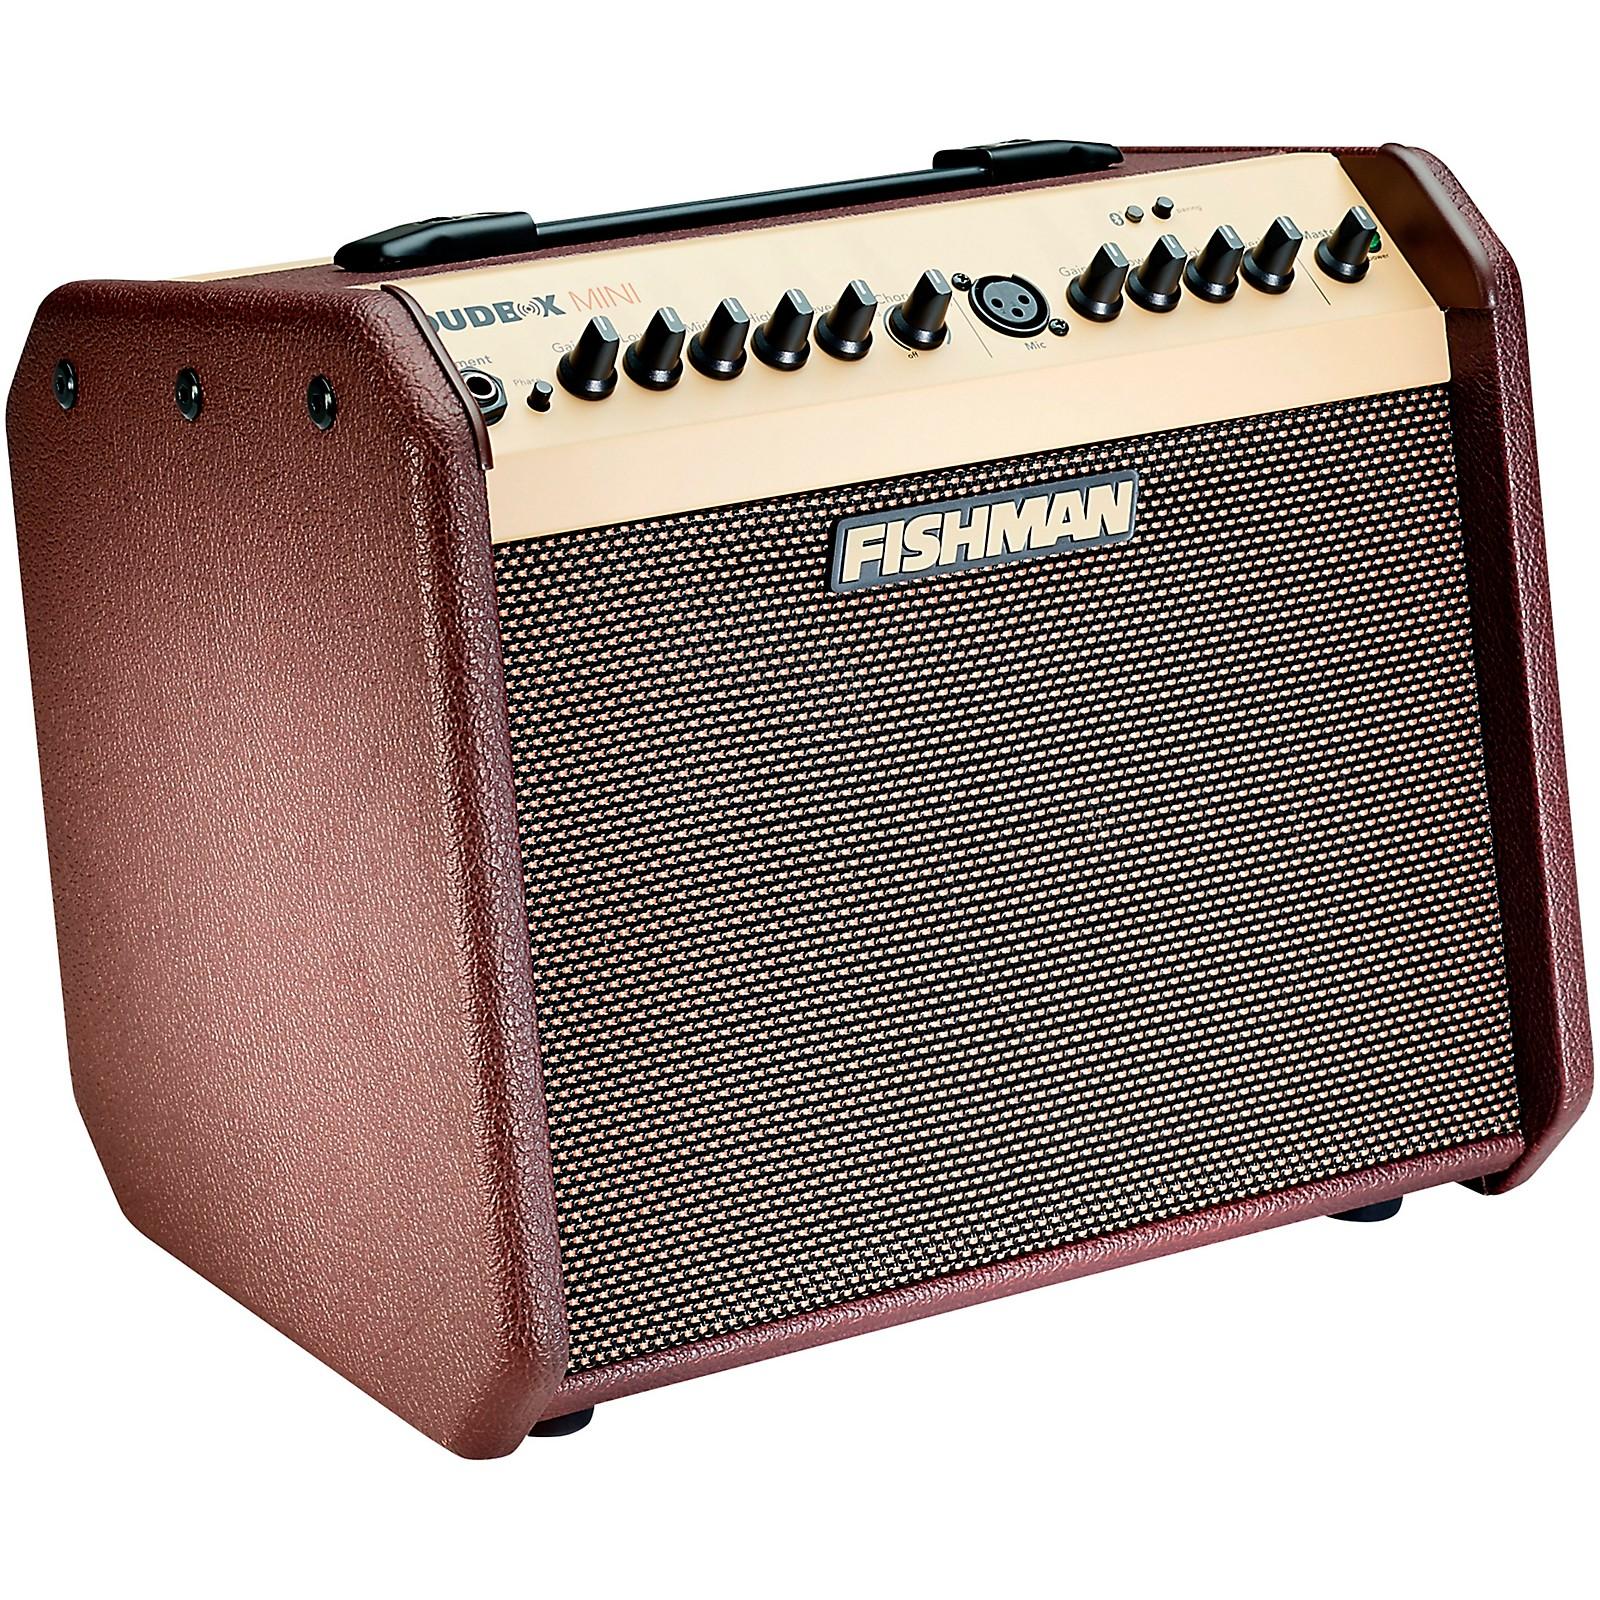 Fishman Loudbox Mini 60W 1x6.5 Acoustic Guitar Combo Amp with Bluetooth